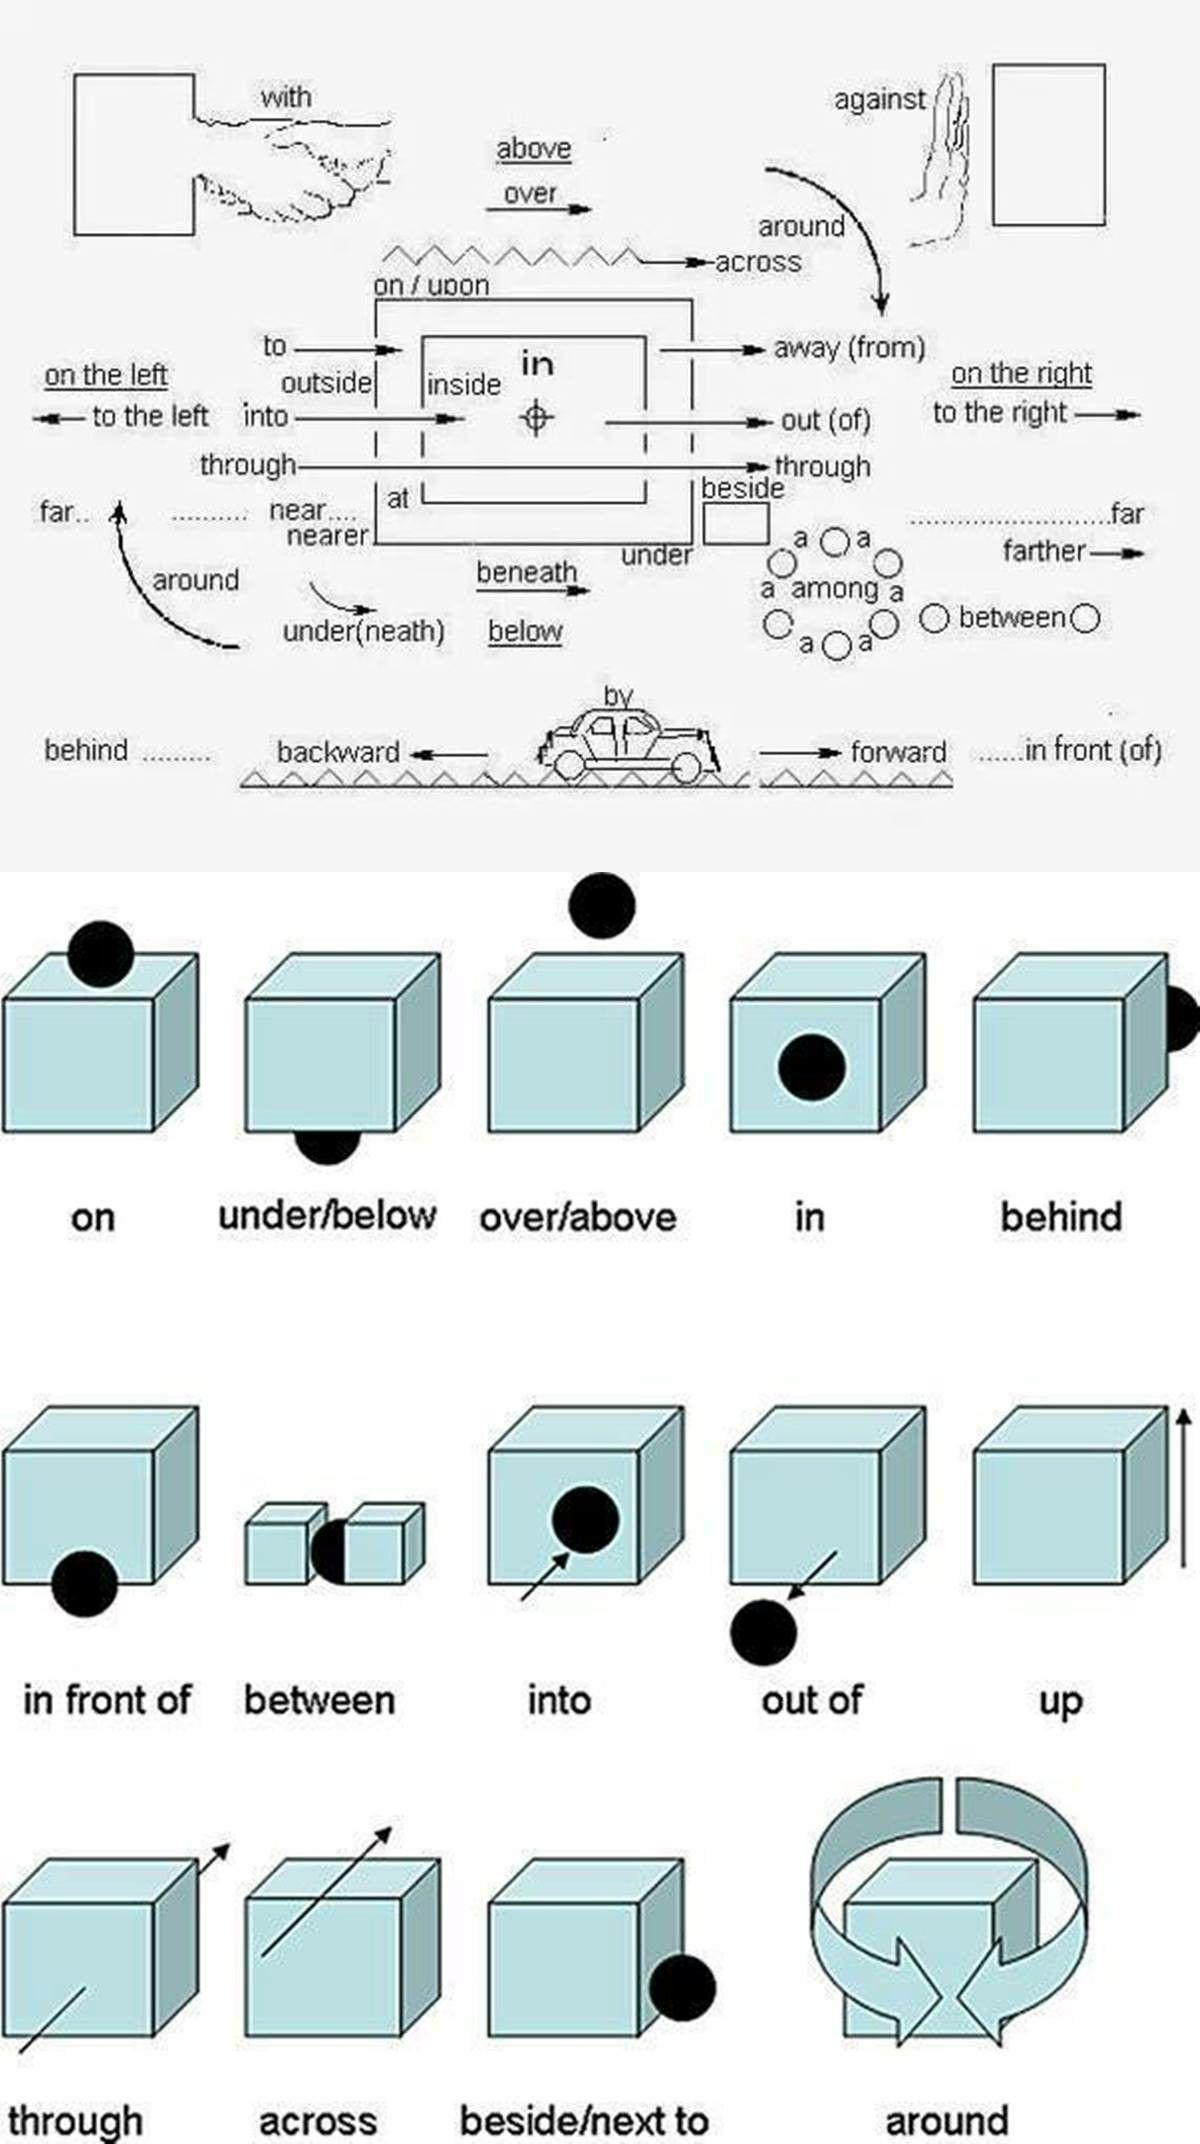 English Prepositions English Languages Vocabularies